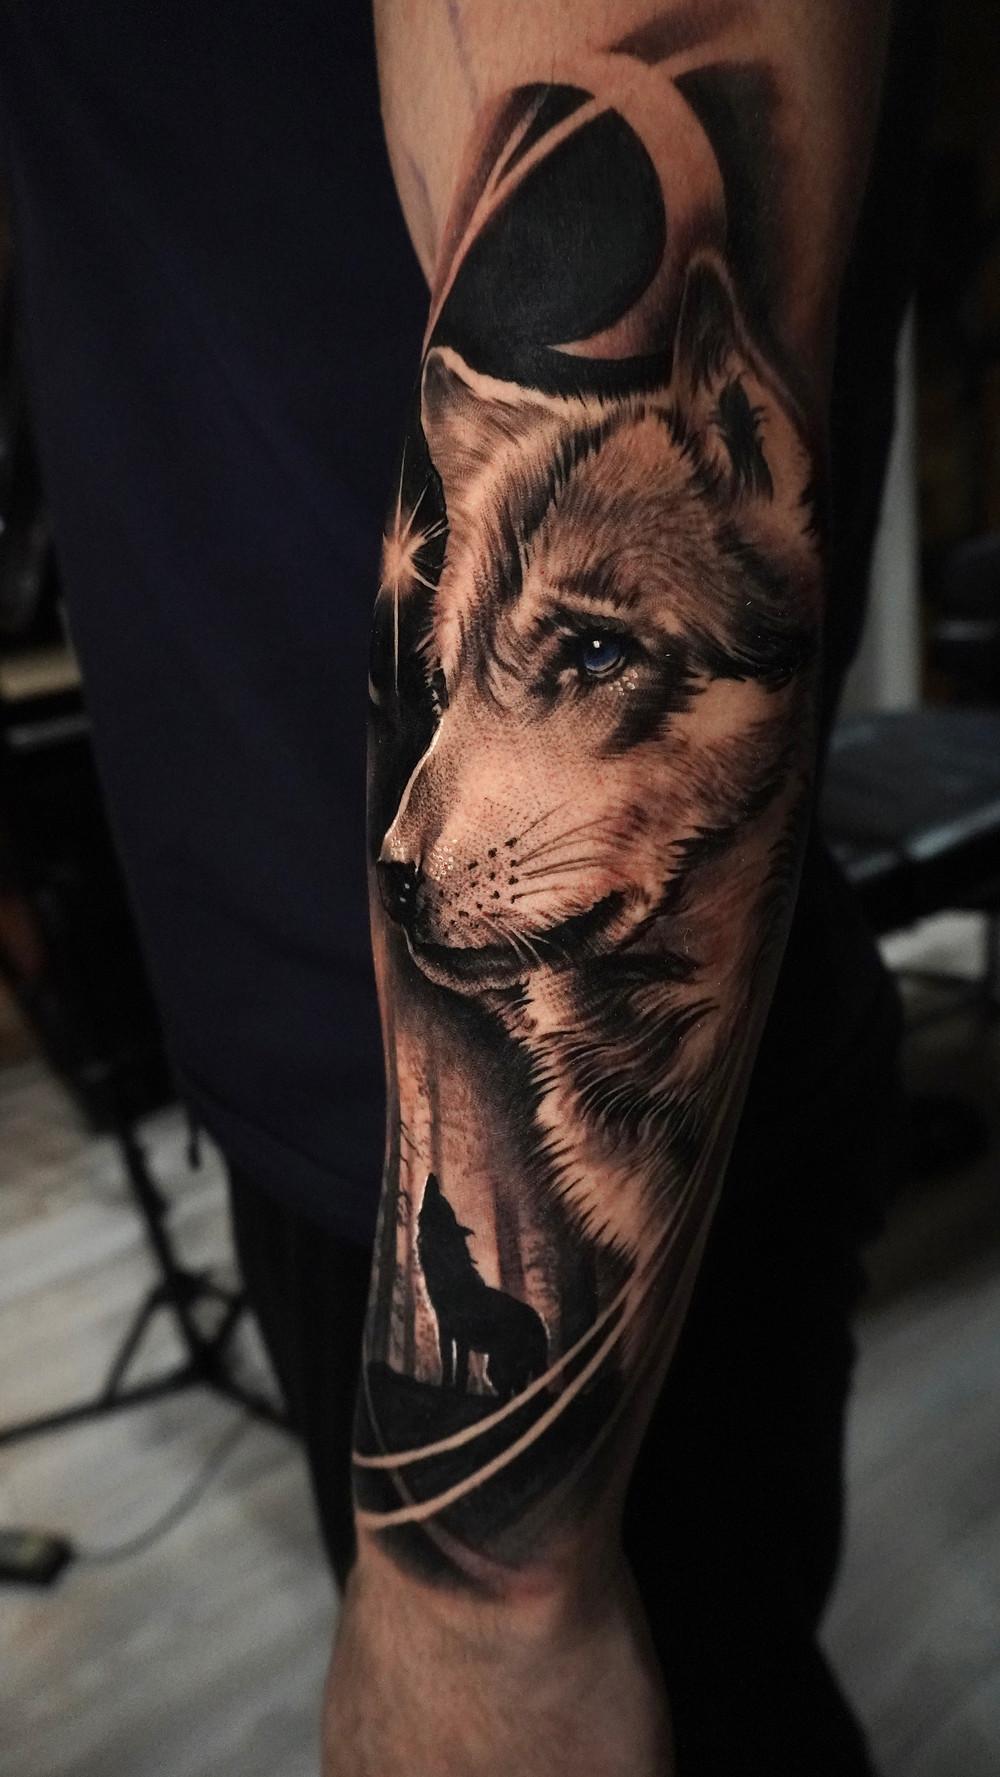 Shine Tattoo Studio : shine, tattoo, studio, SKILLED, TATTOO, ARTIST